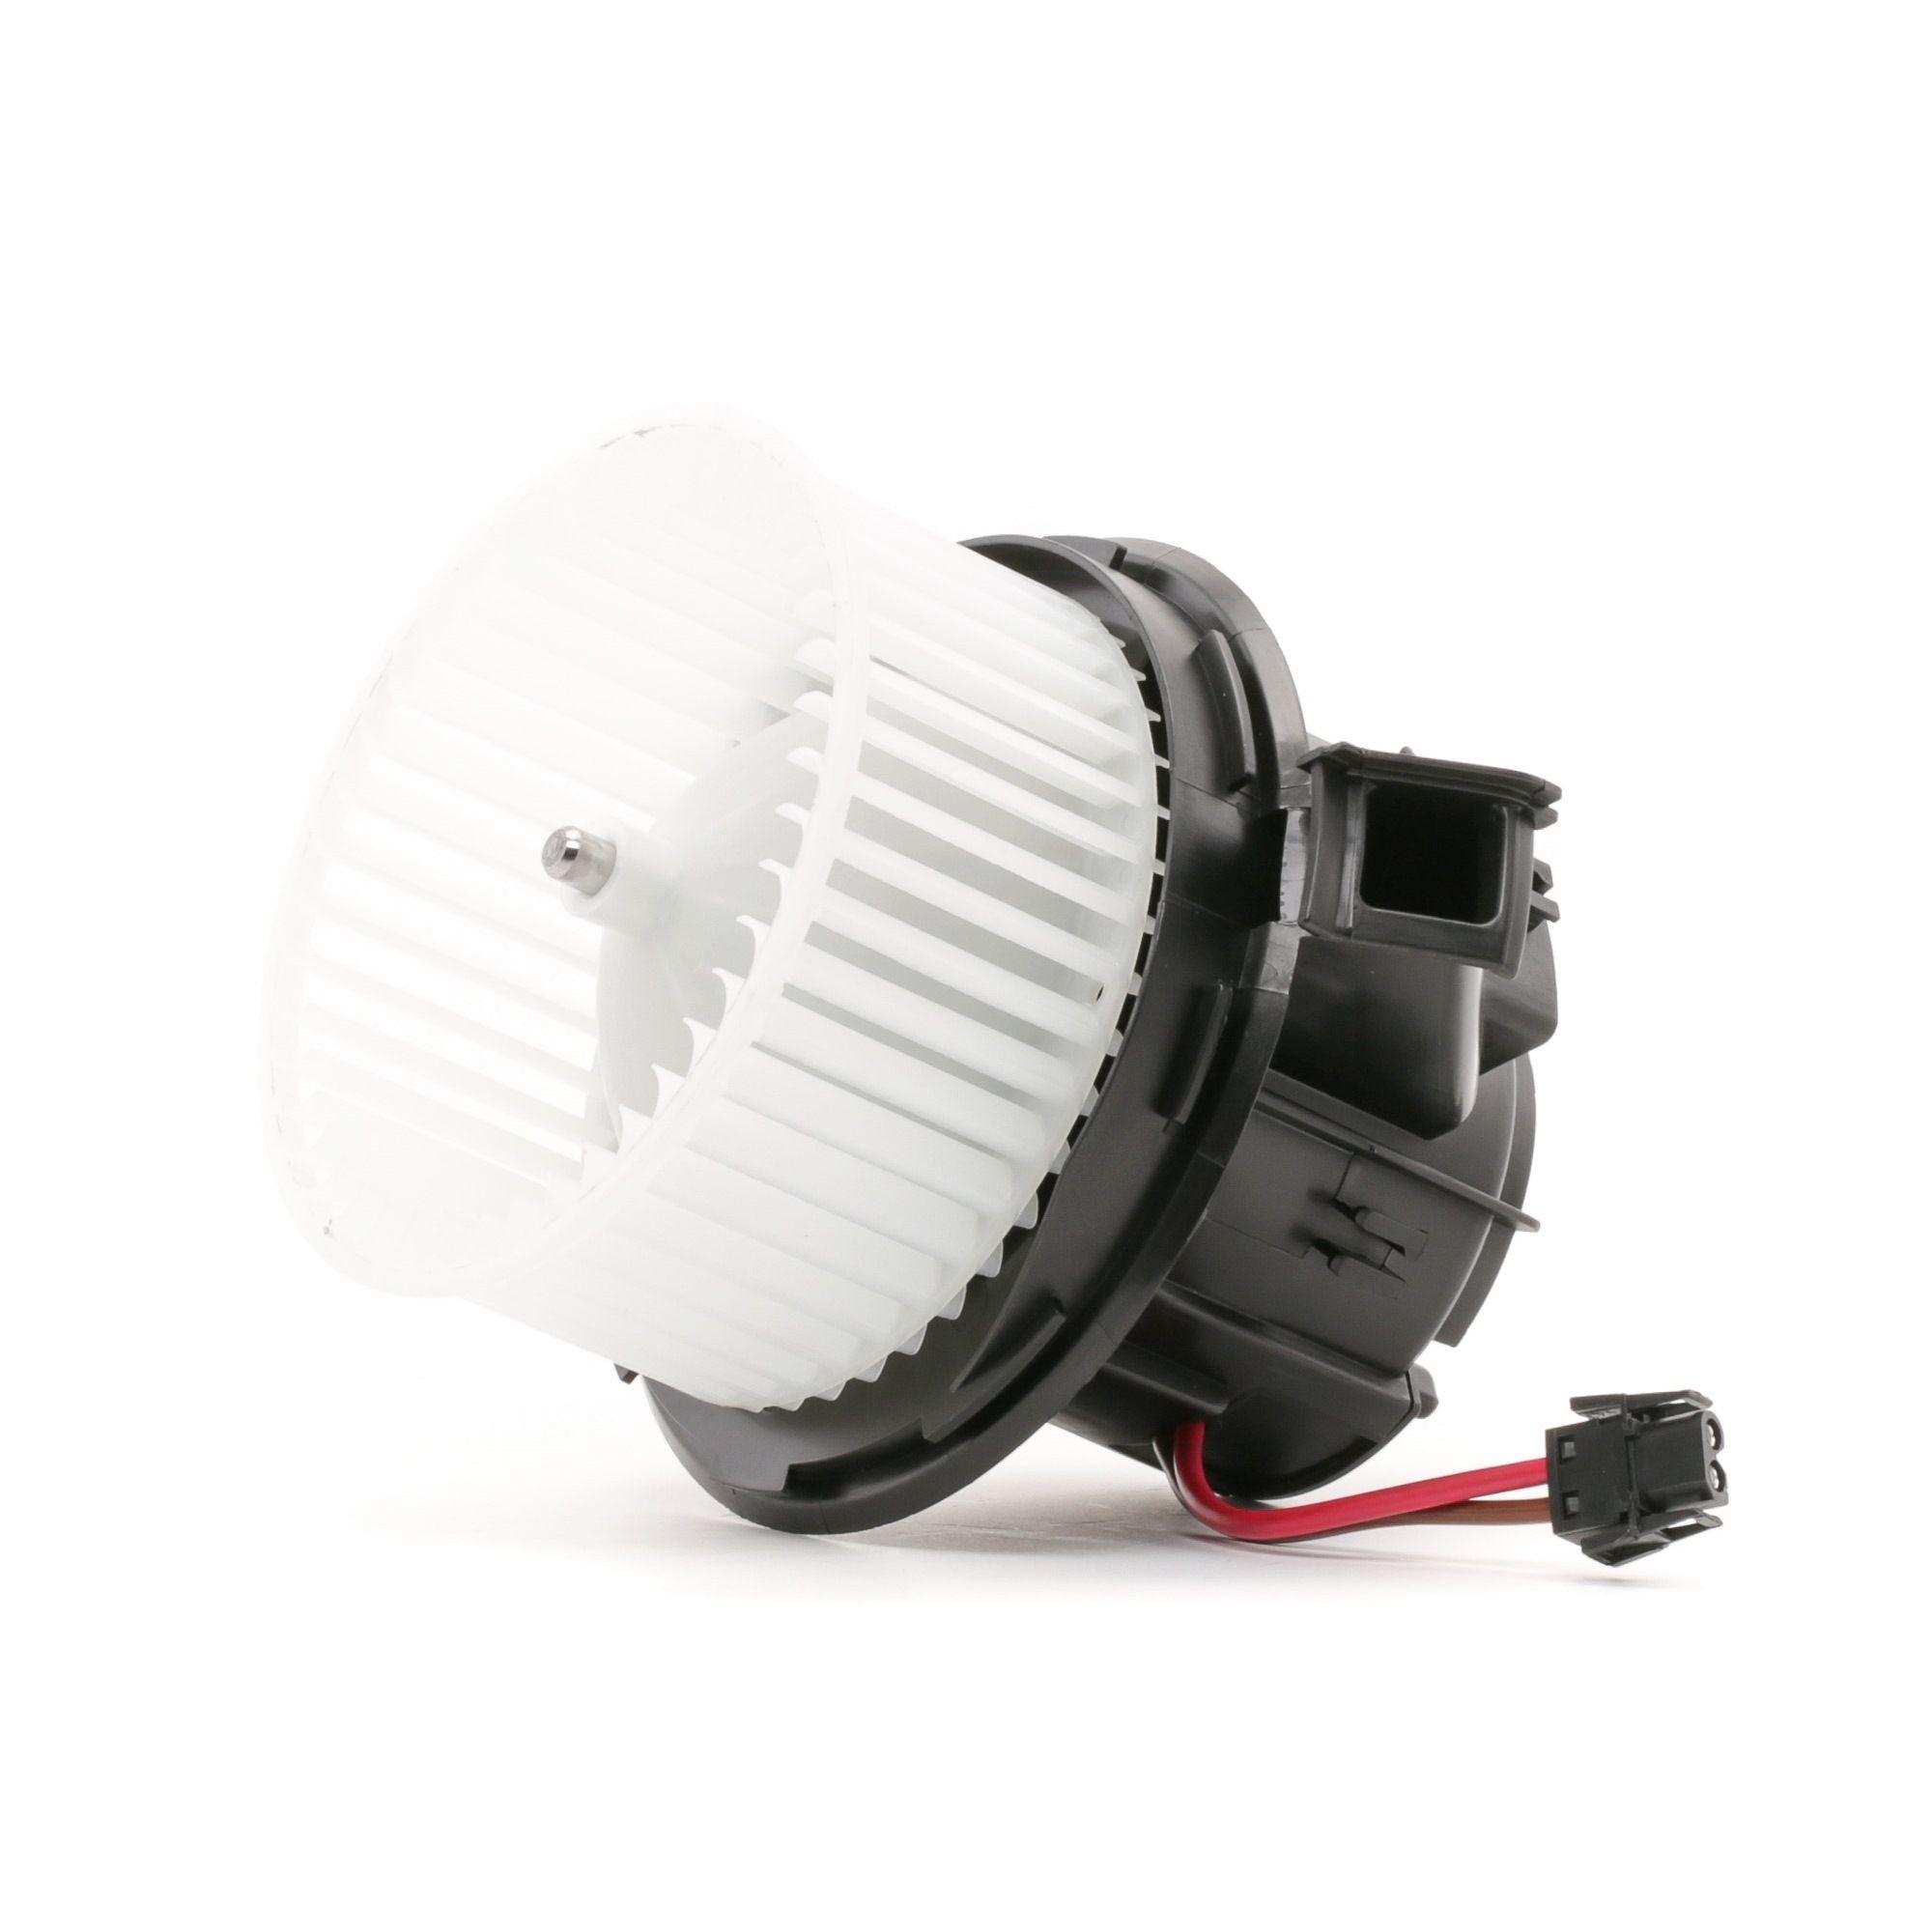 Buy original Blower motor NRF 34041